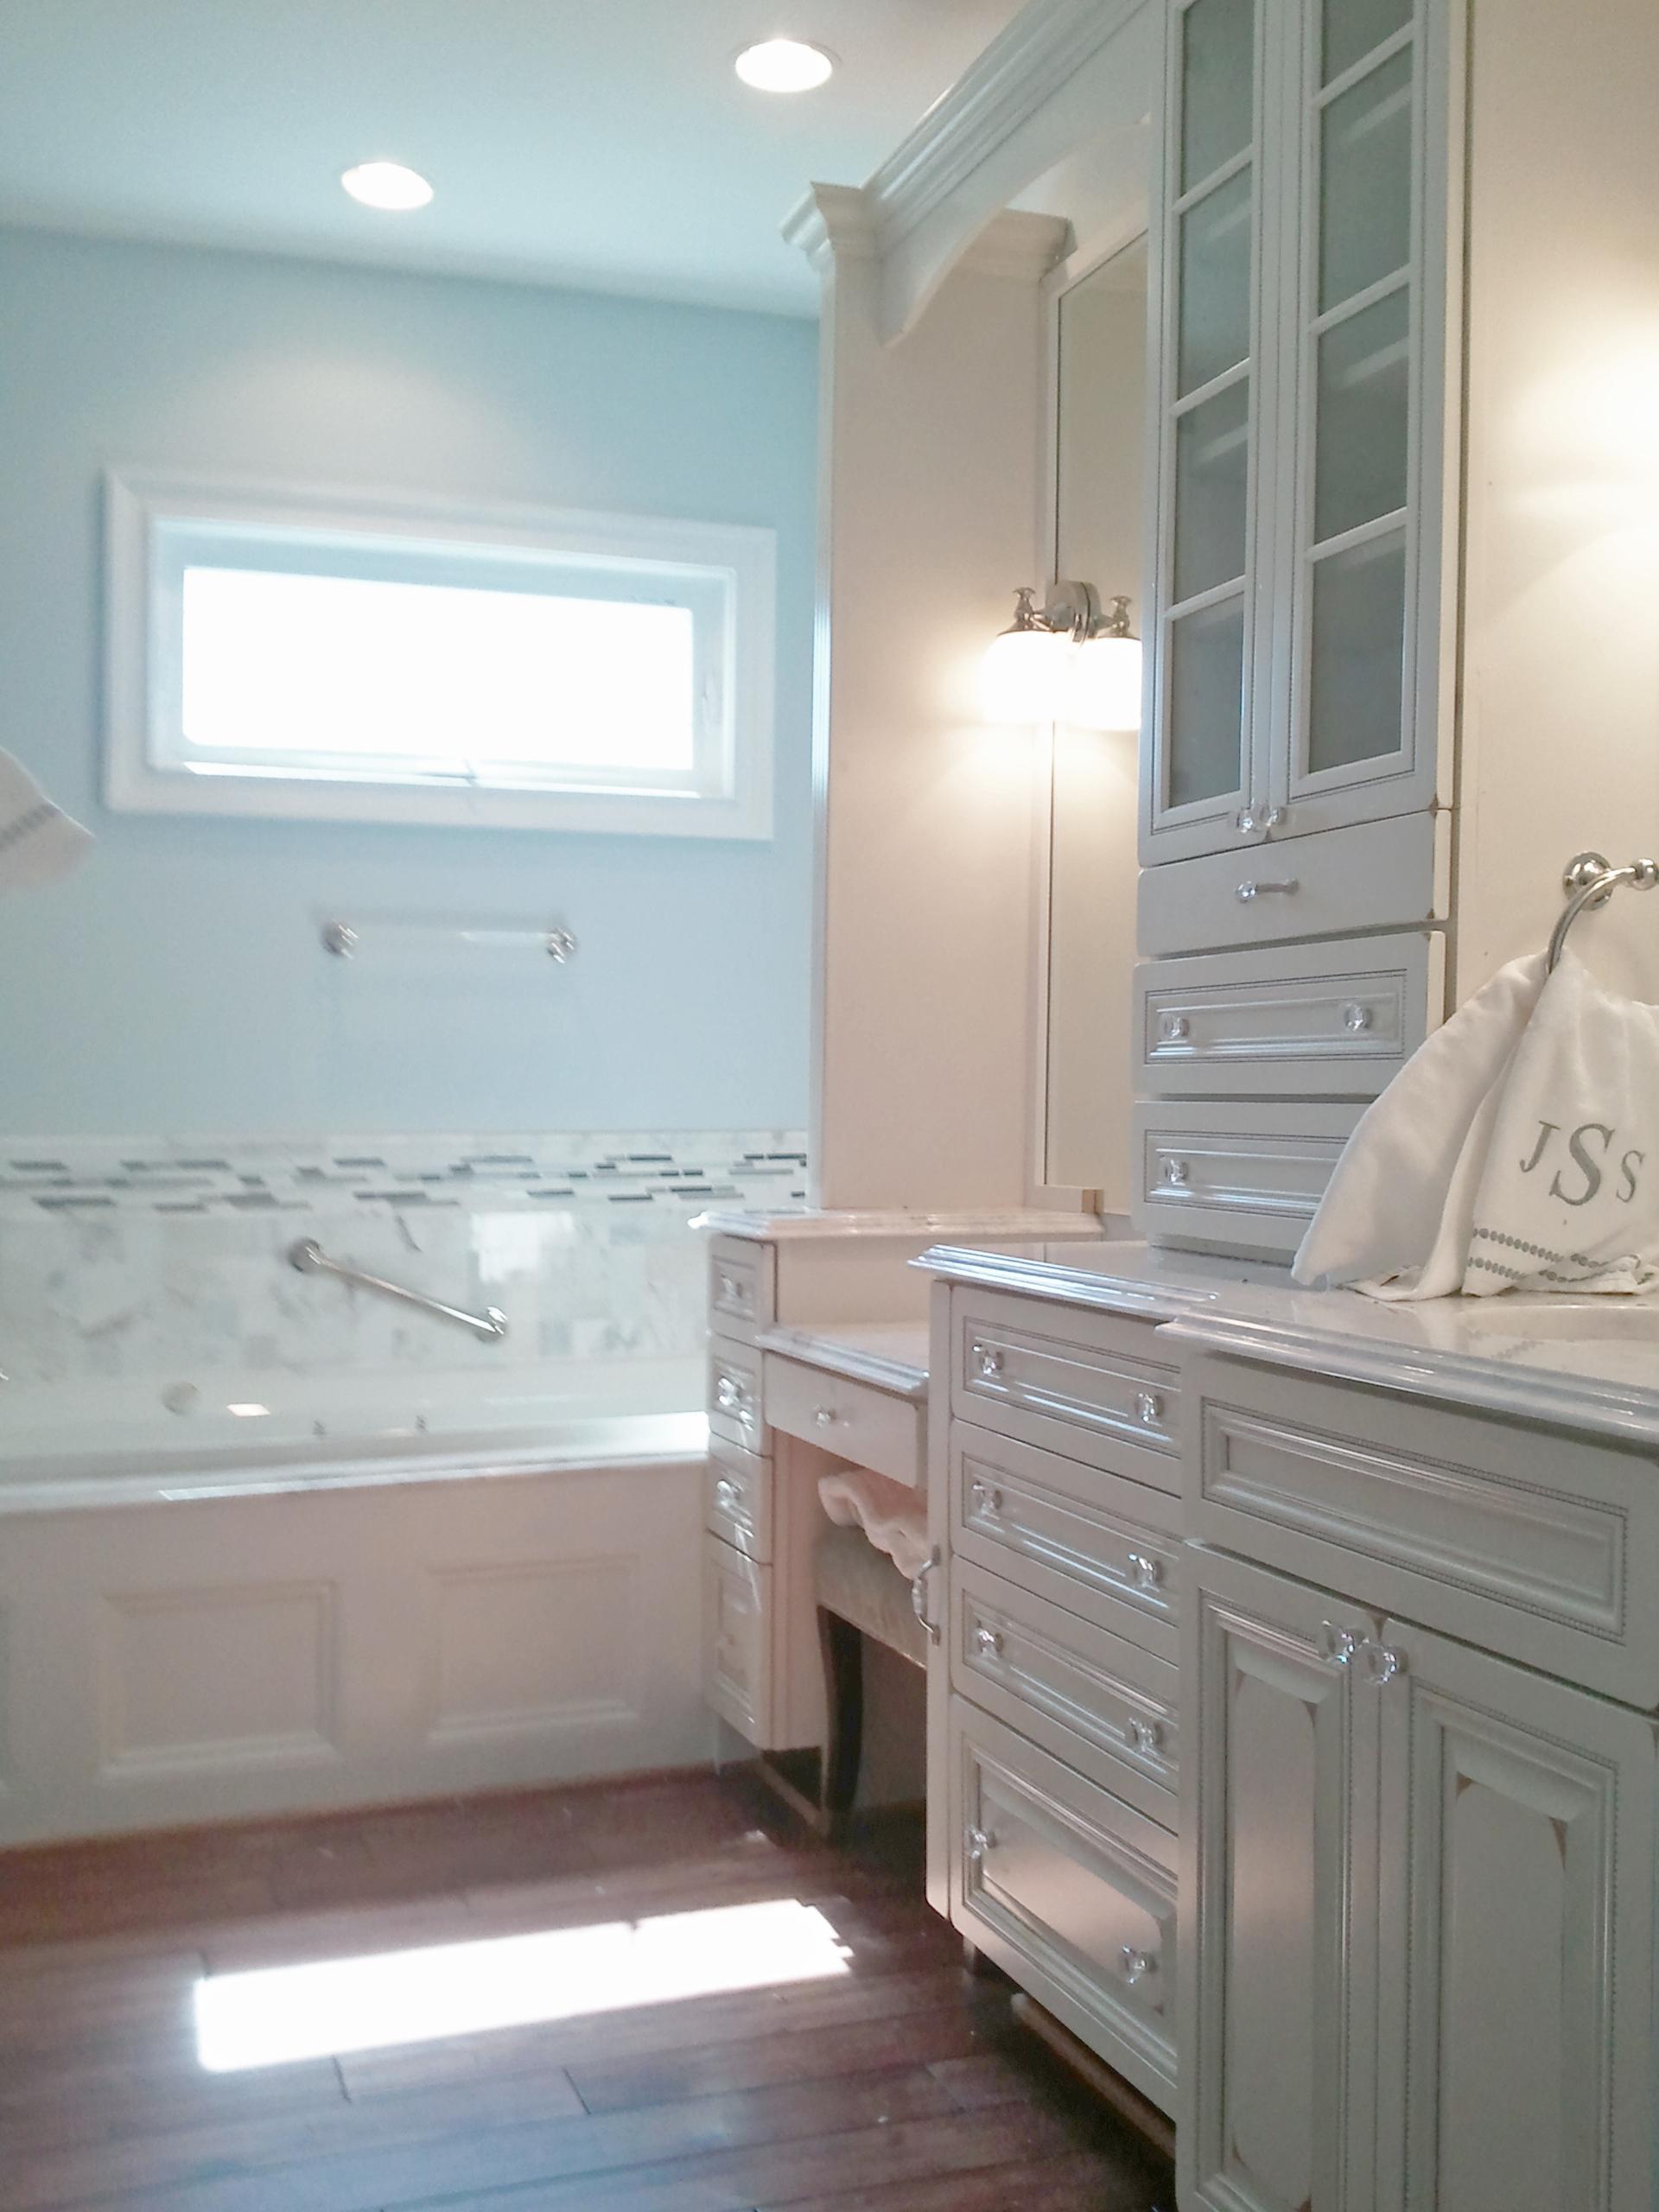 Distressed Vanity with Raised Panel Doors & Drawers (2 of 3)